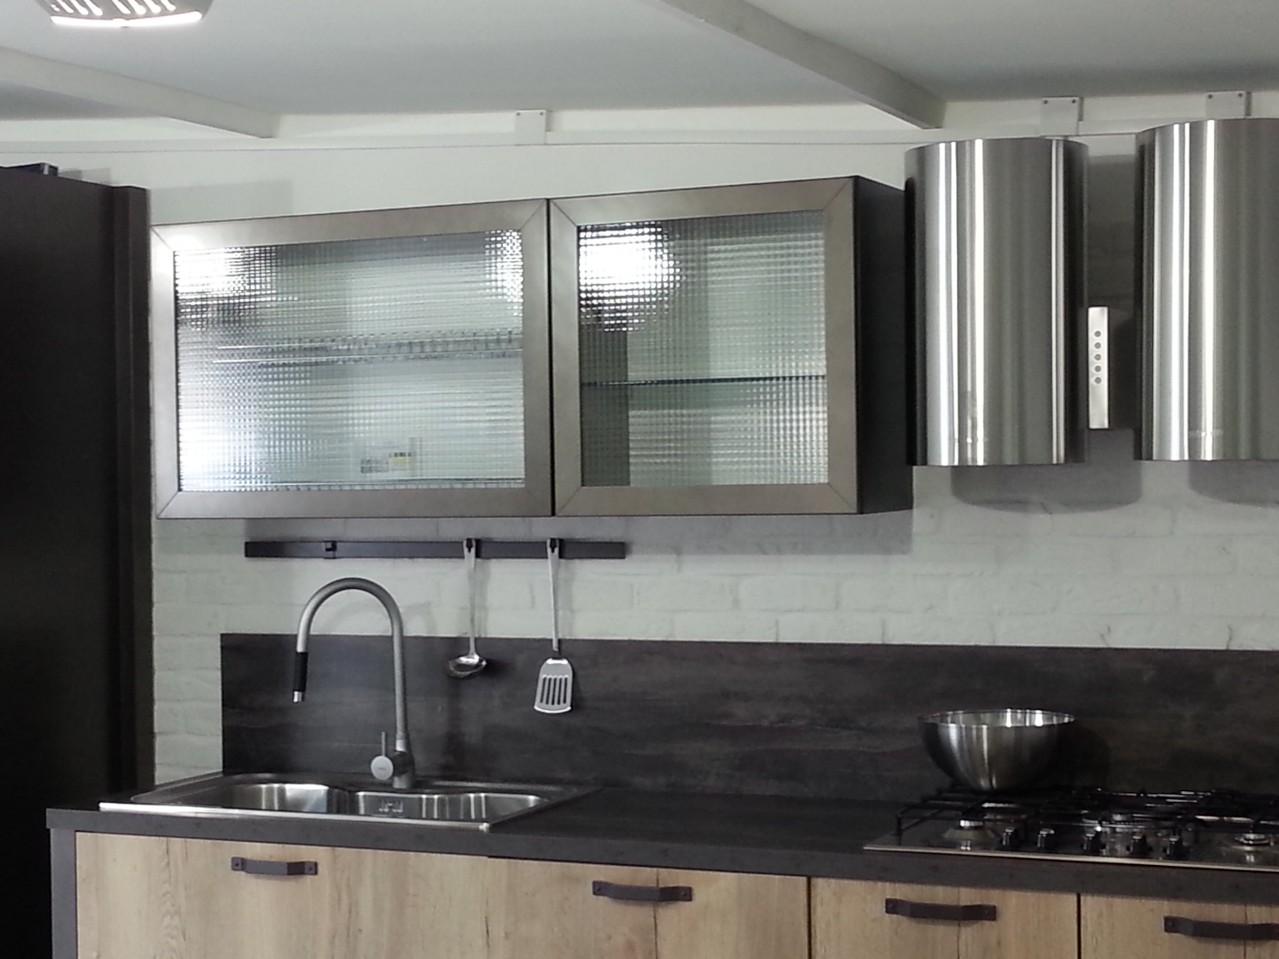 Cucina mattone b trep rm 15 rinnovare con la pietra - Rivestimento cucina finta pietra ...